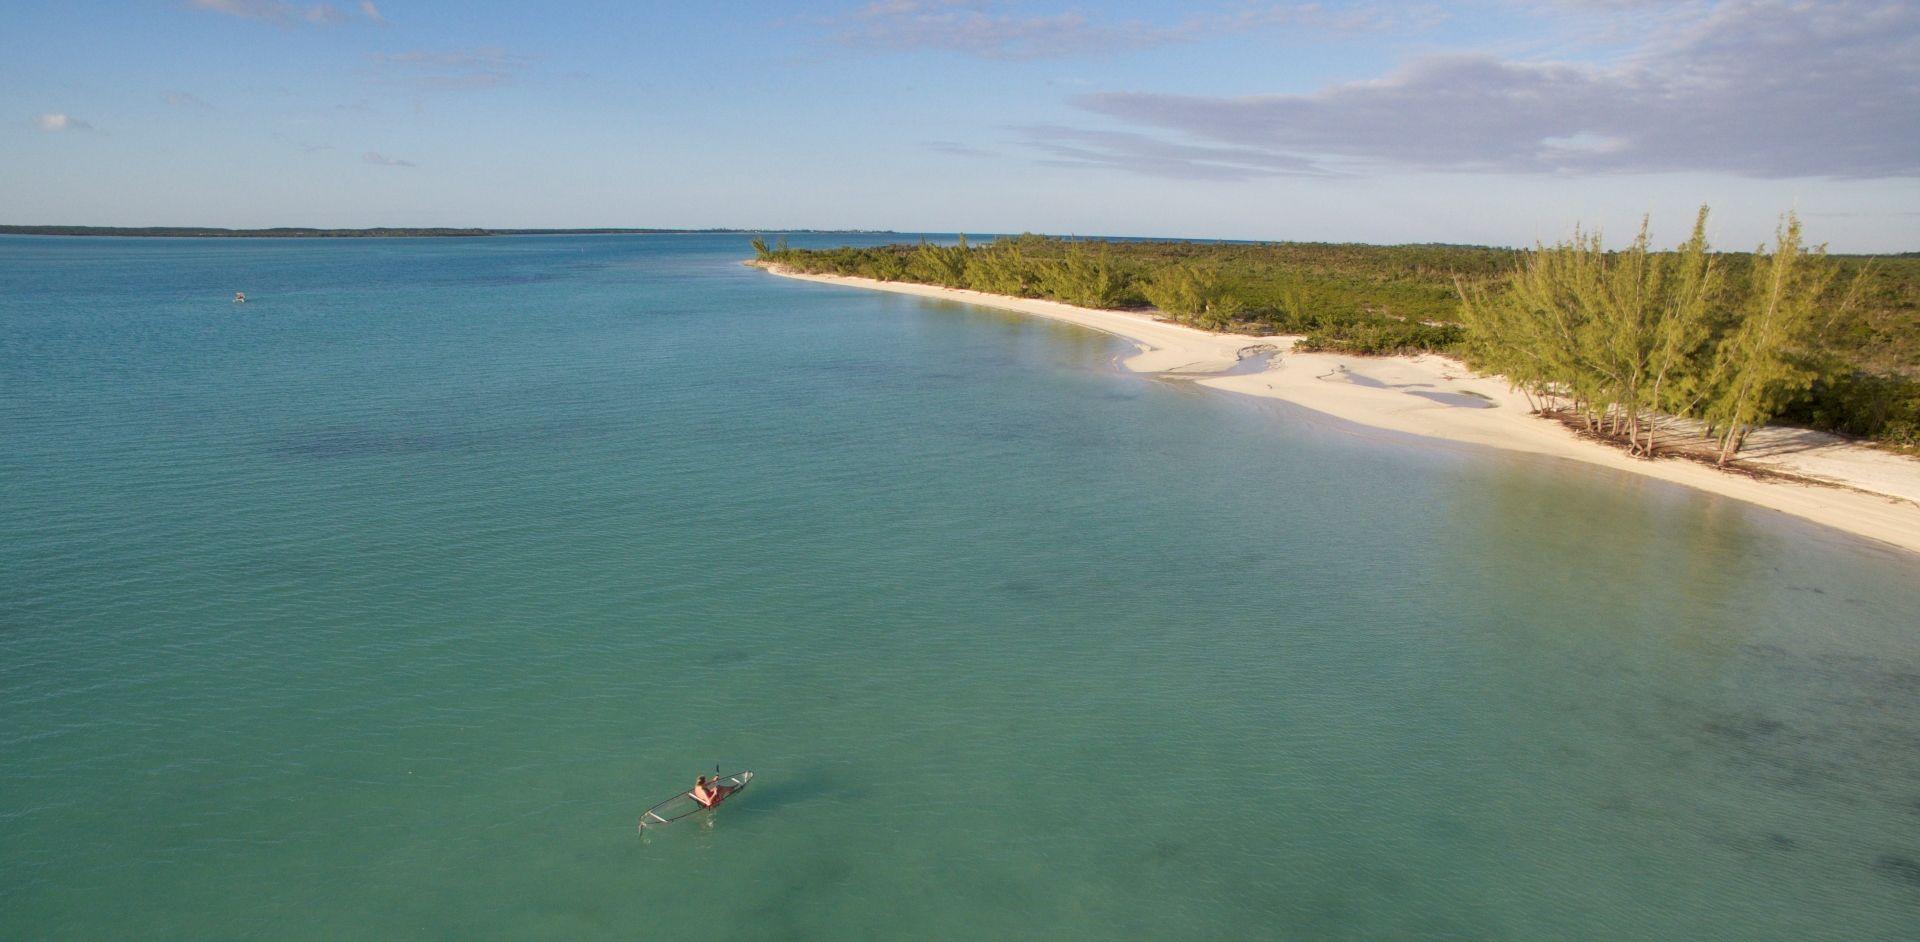 Explore the coast and mangroves